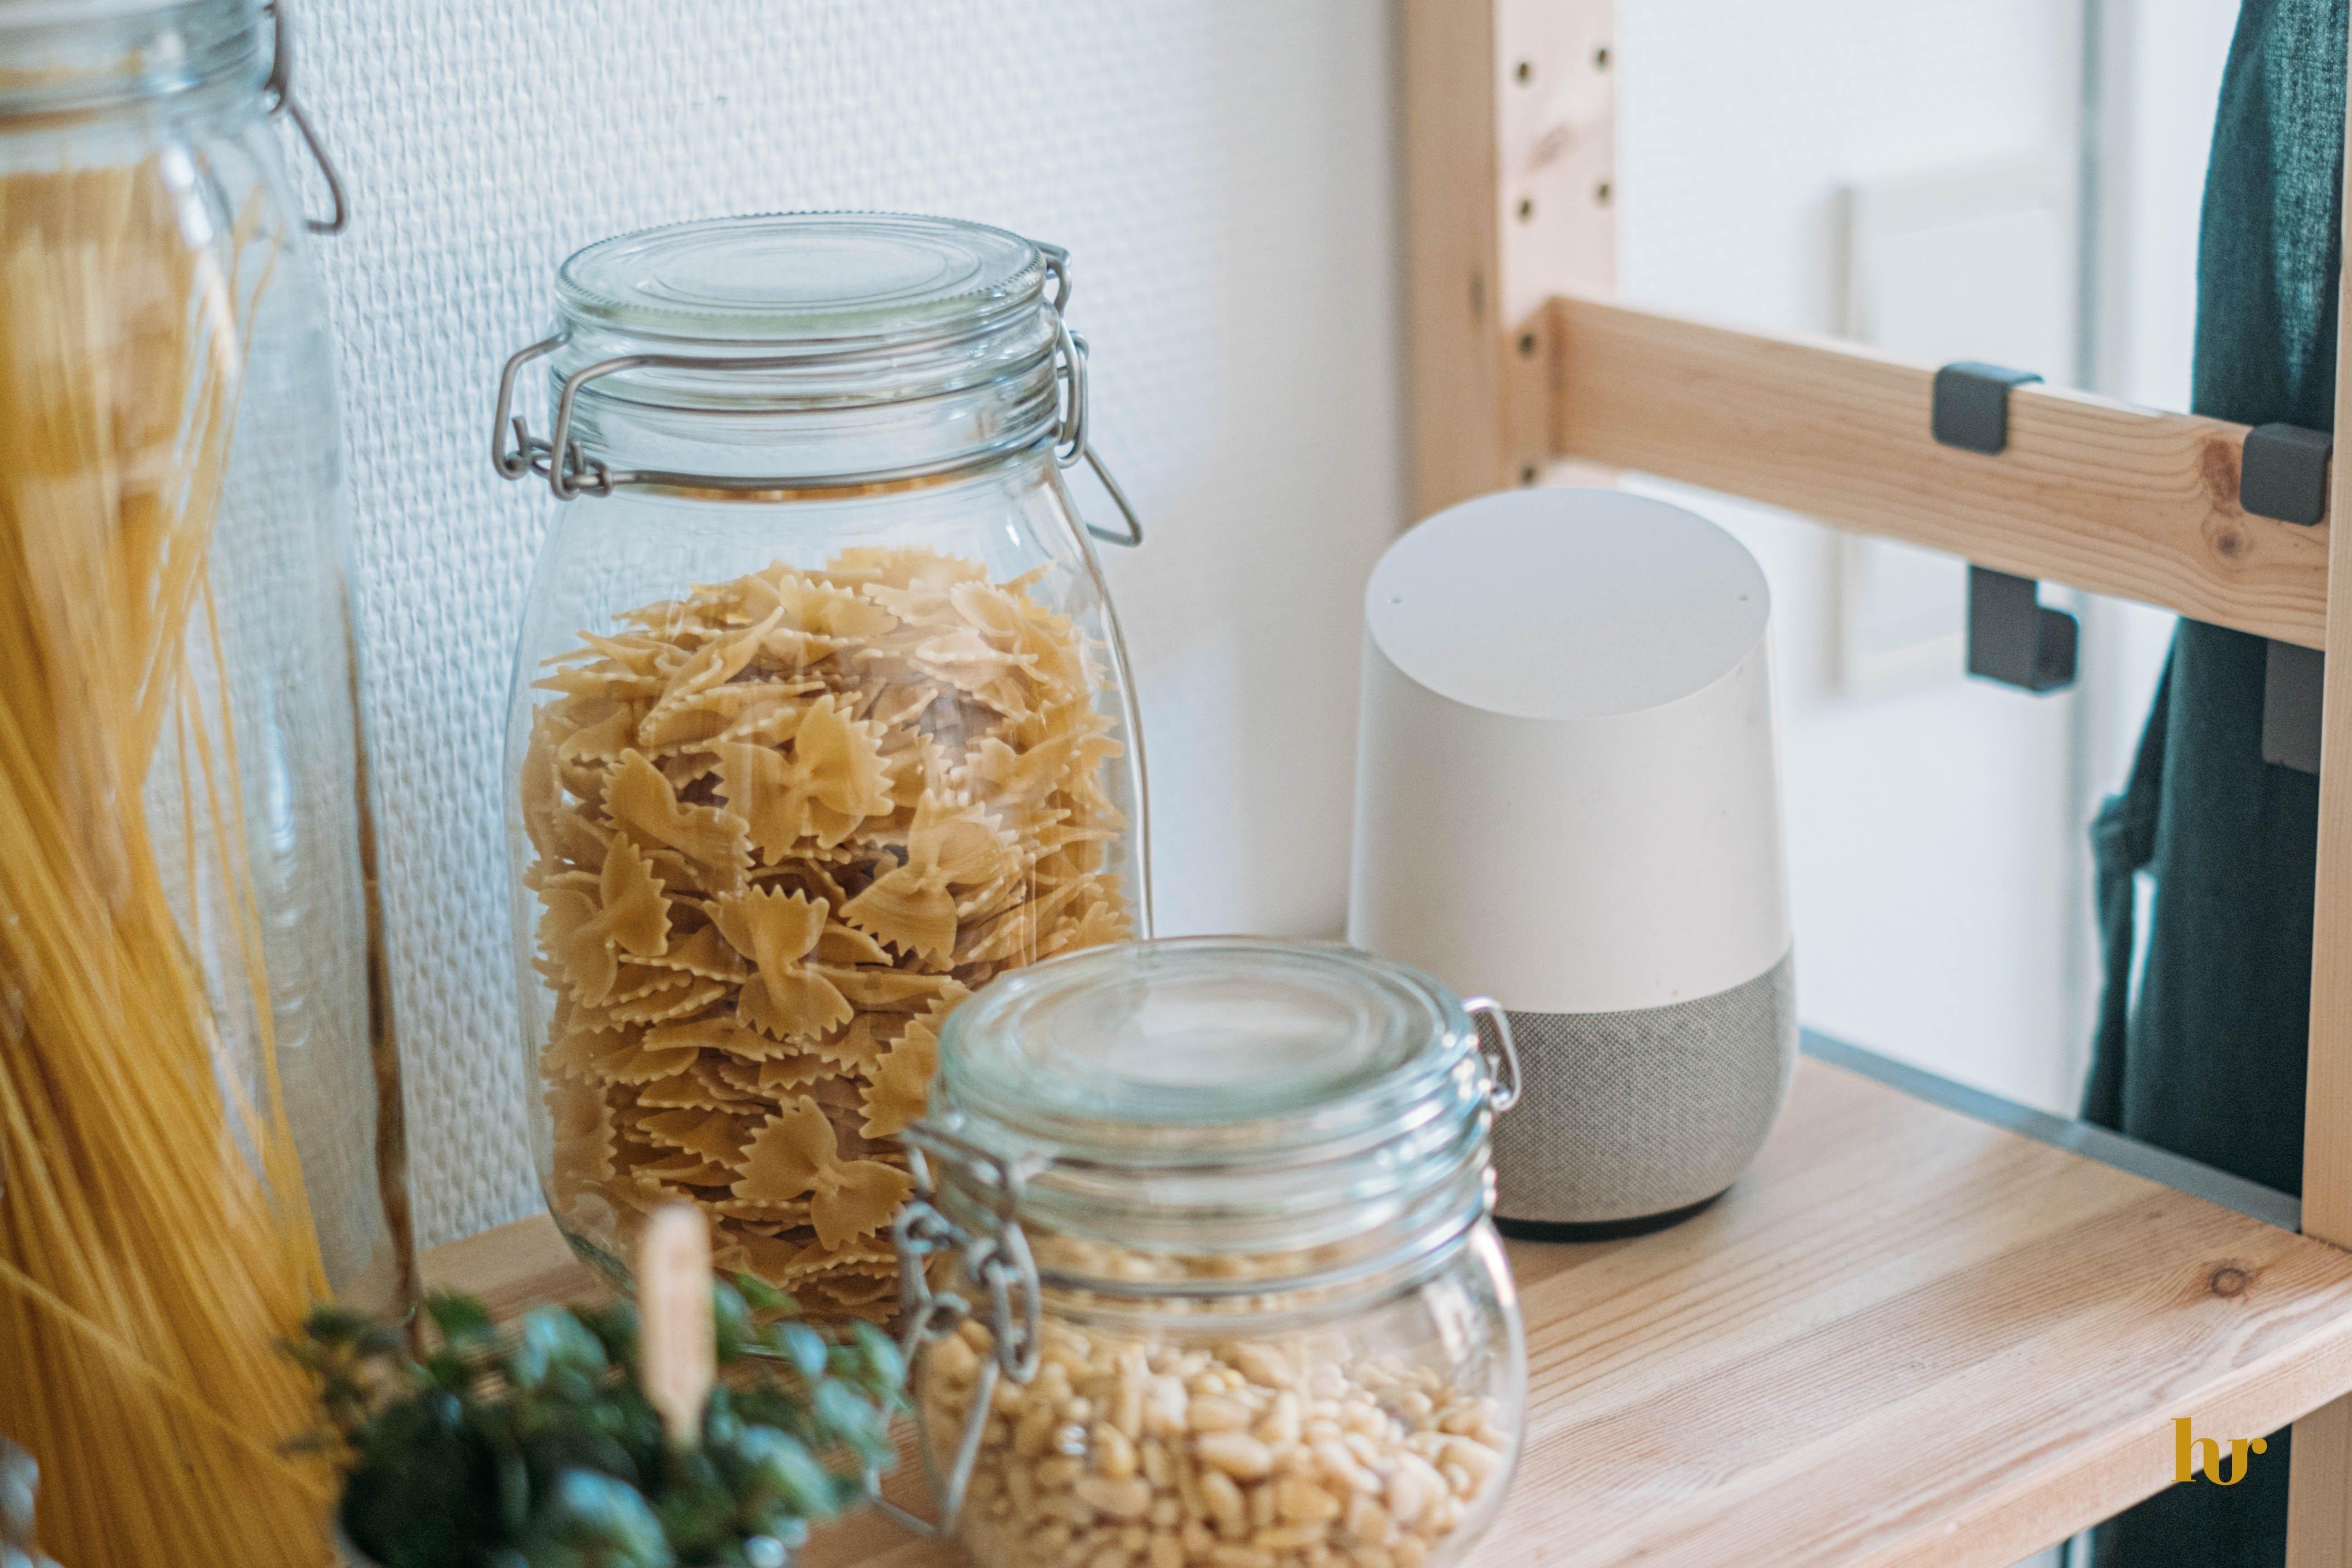 australians using smart speakers in their homes